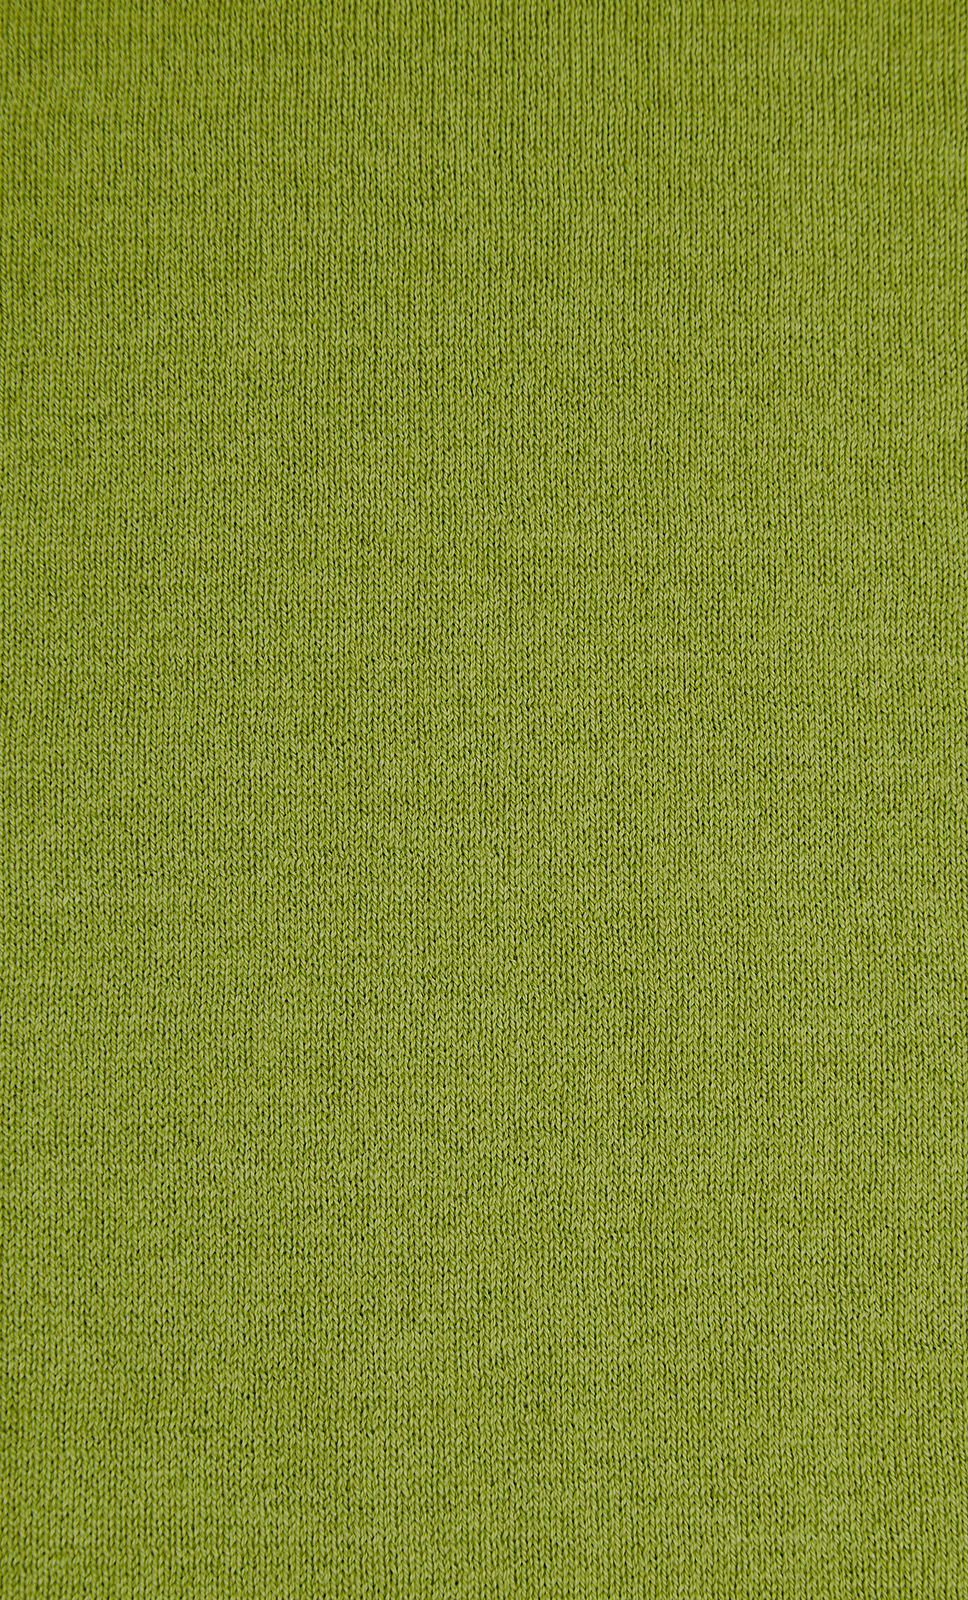 Cottonclub-Posey-Green